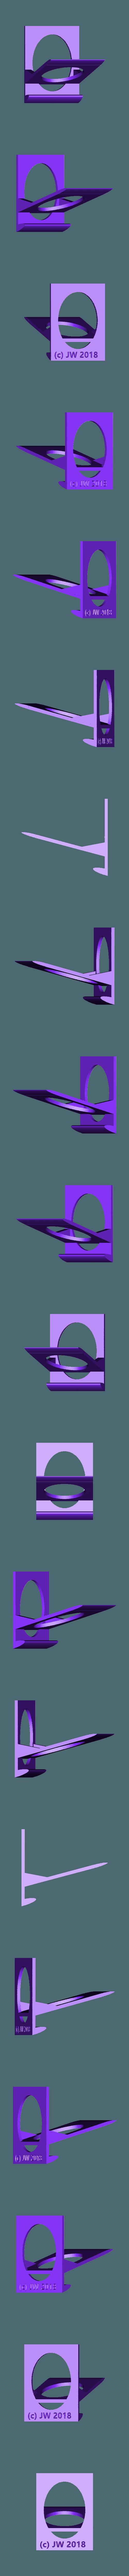 universele_smartphone_houderV2.stl Download free STL file Univers smartphone holder • Object to 3D print, Joep